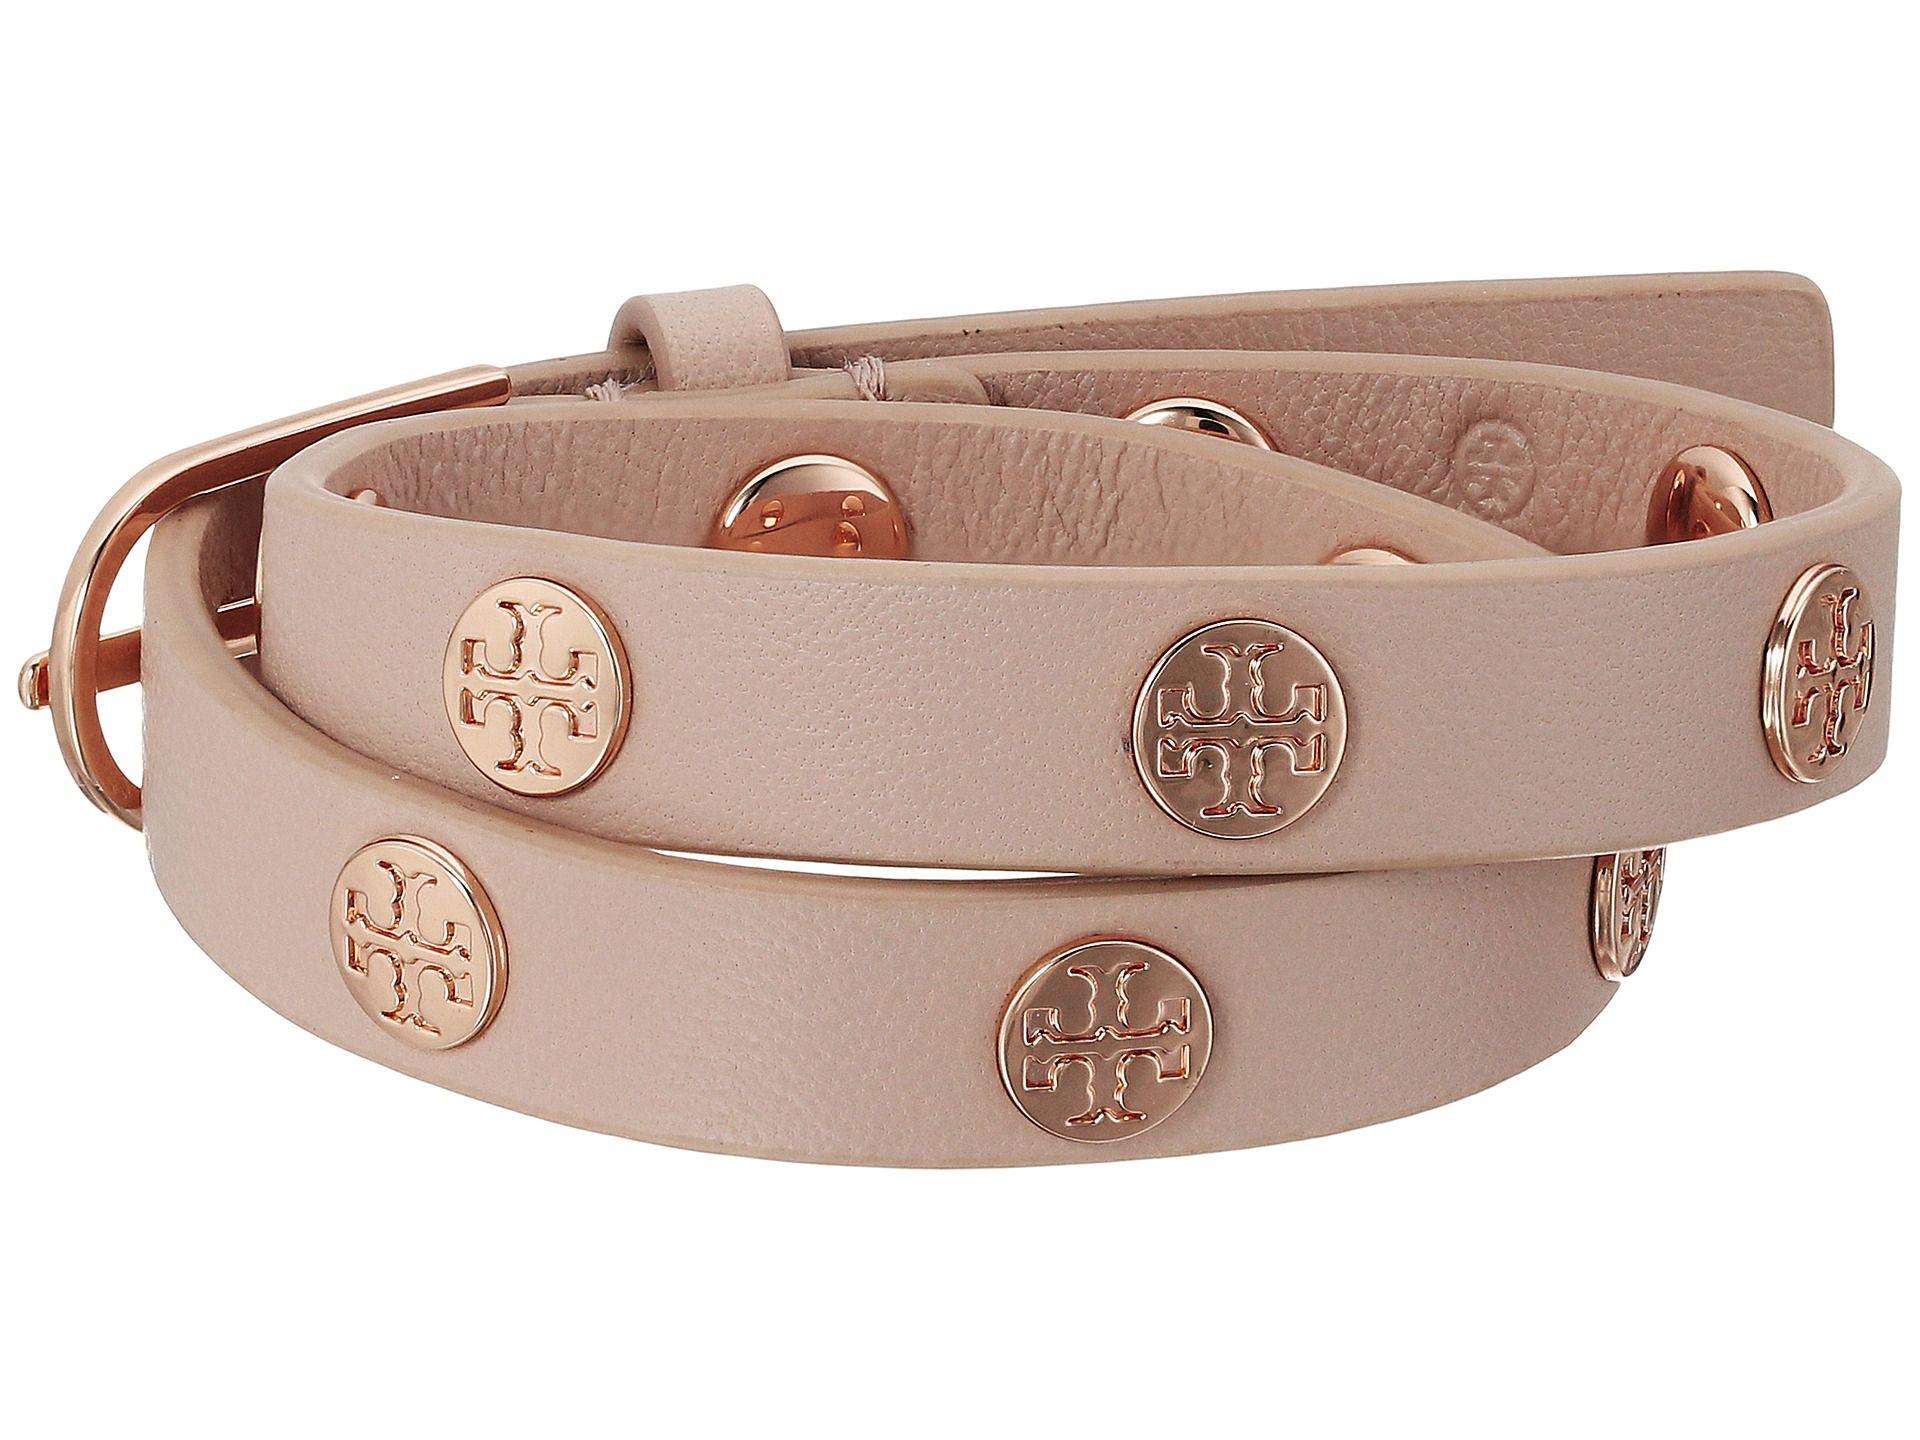 Tory Burch Double Wrap Logo Stud Bracelet Light Oak Rose Gold Zos